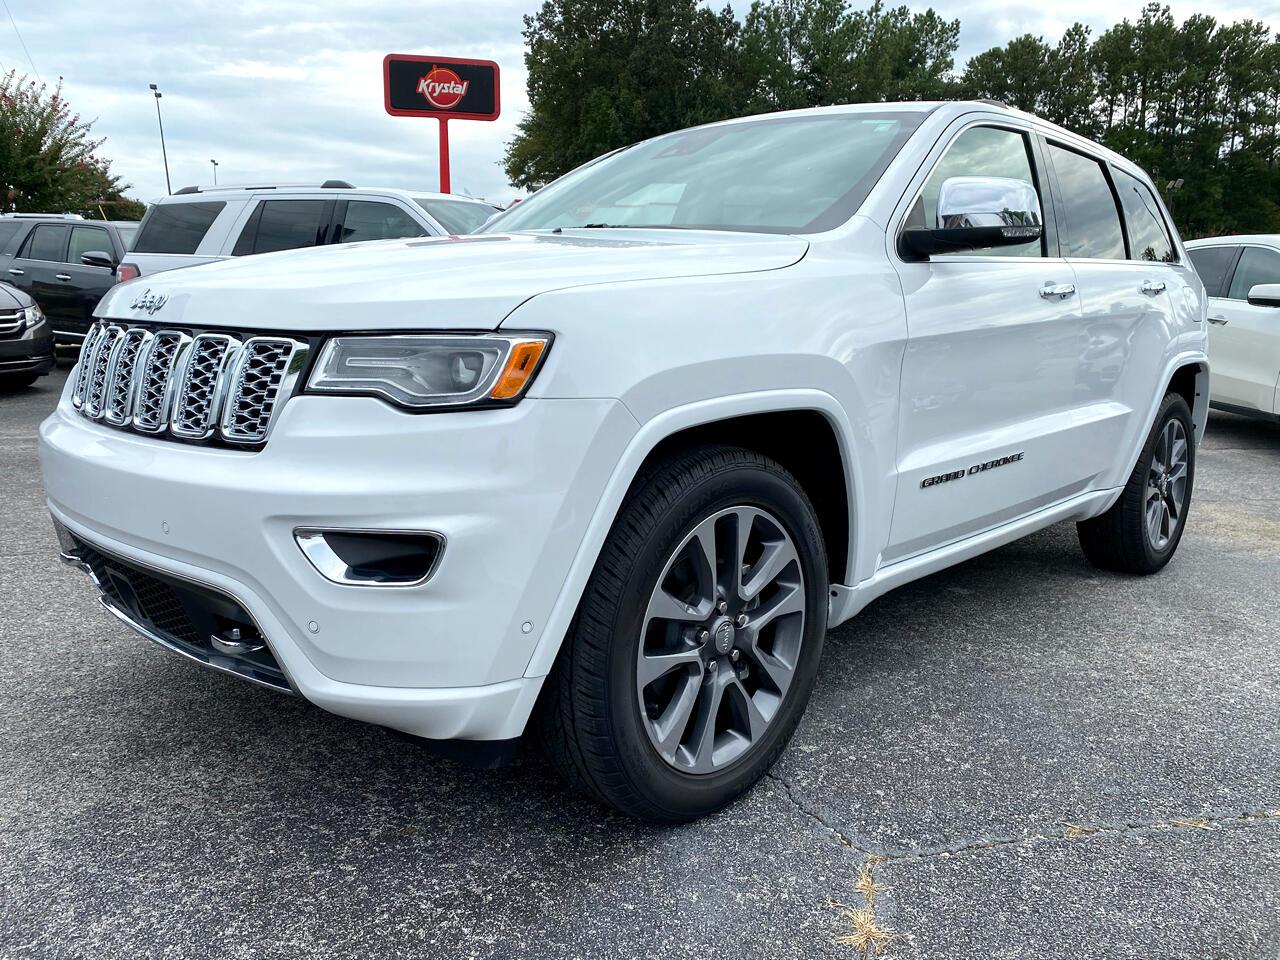 Jeep Grand Cherokee Overland 2WD 2017